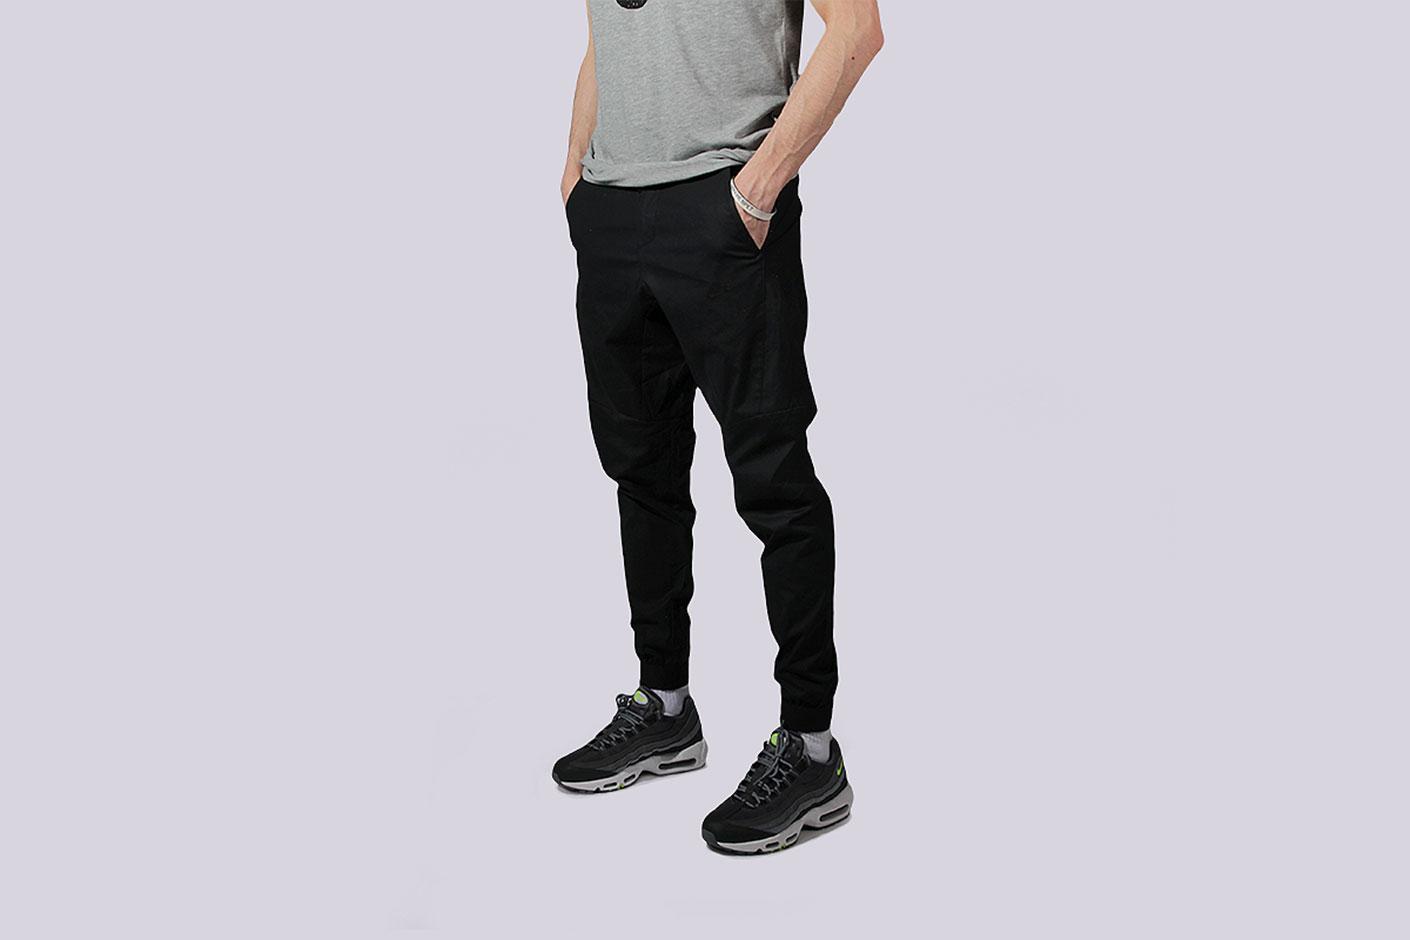 040e2862e85a ... Мужские чёрные брюки Nike Bonded Jogger Pants - фото 2 картинки ...